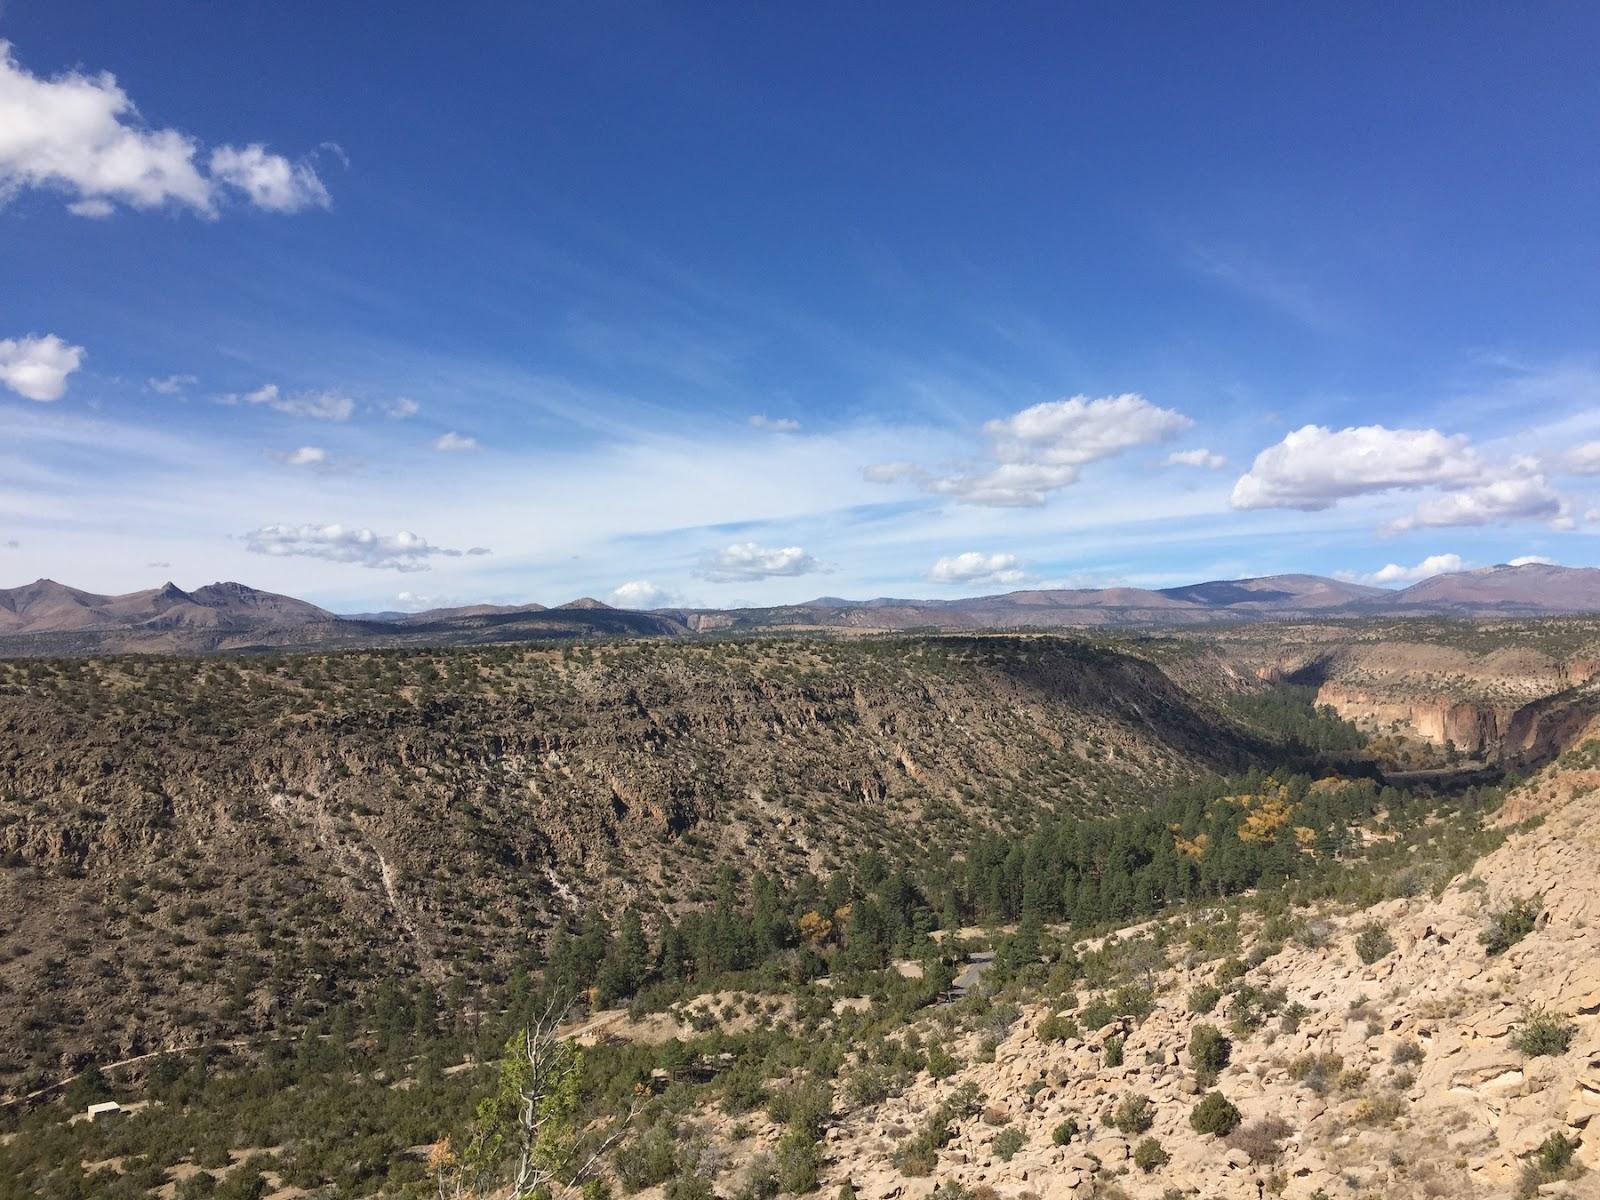 Santa Fe New Mexico travel guide